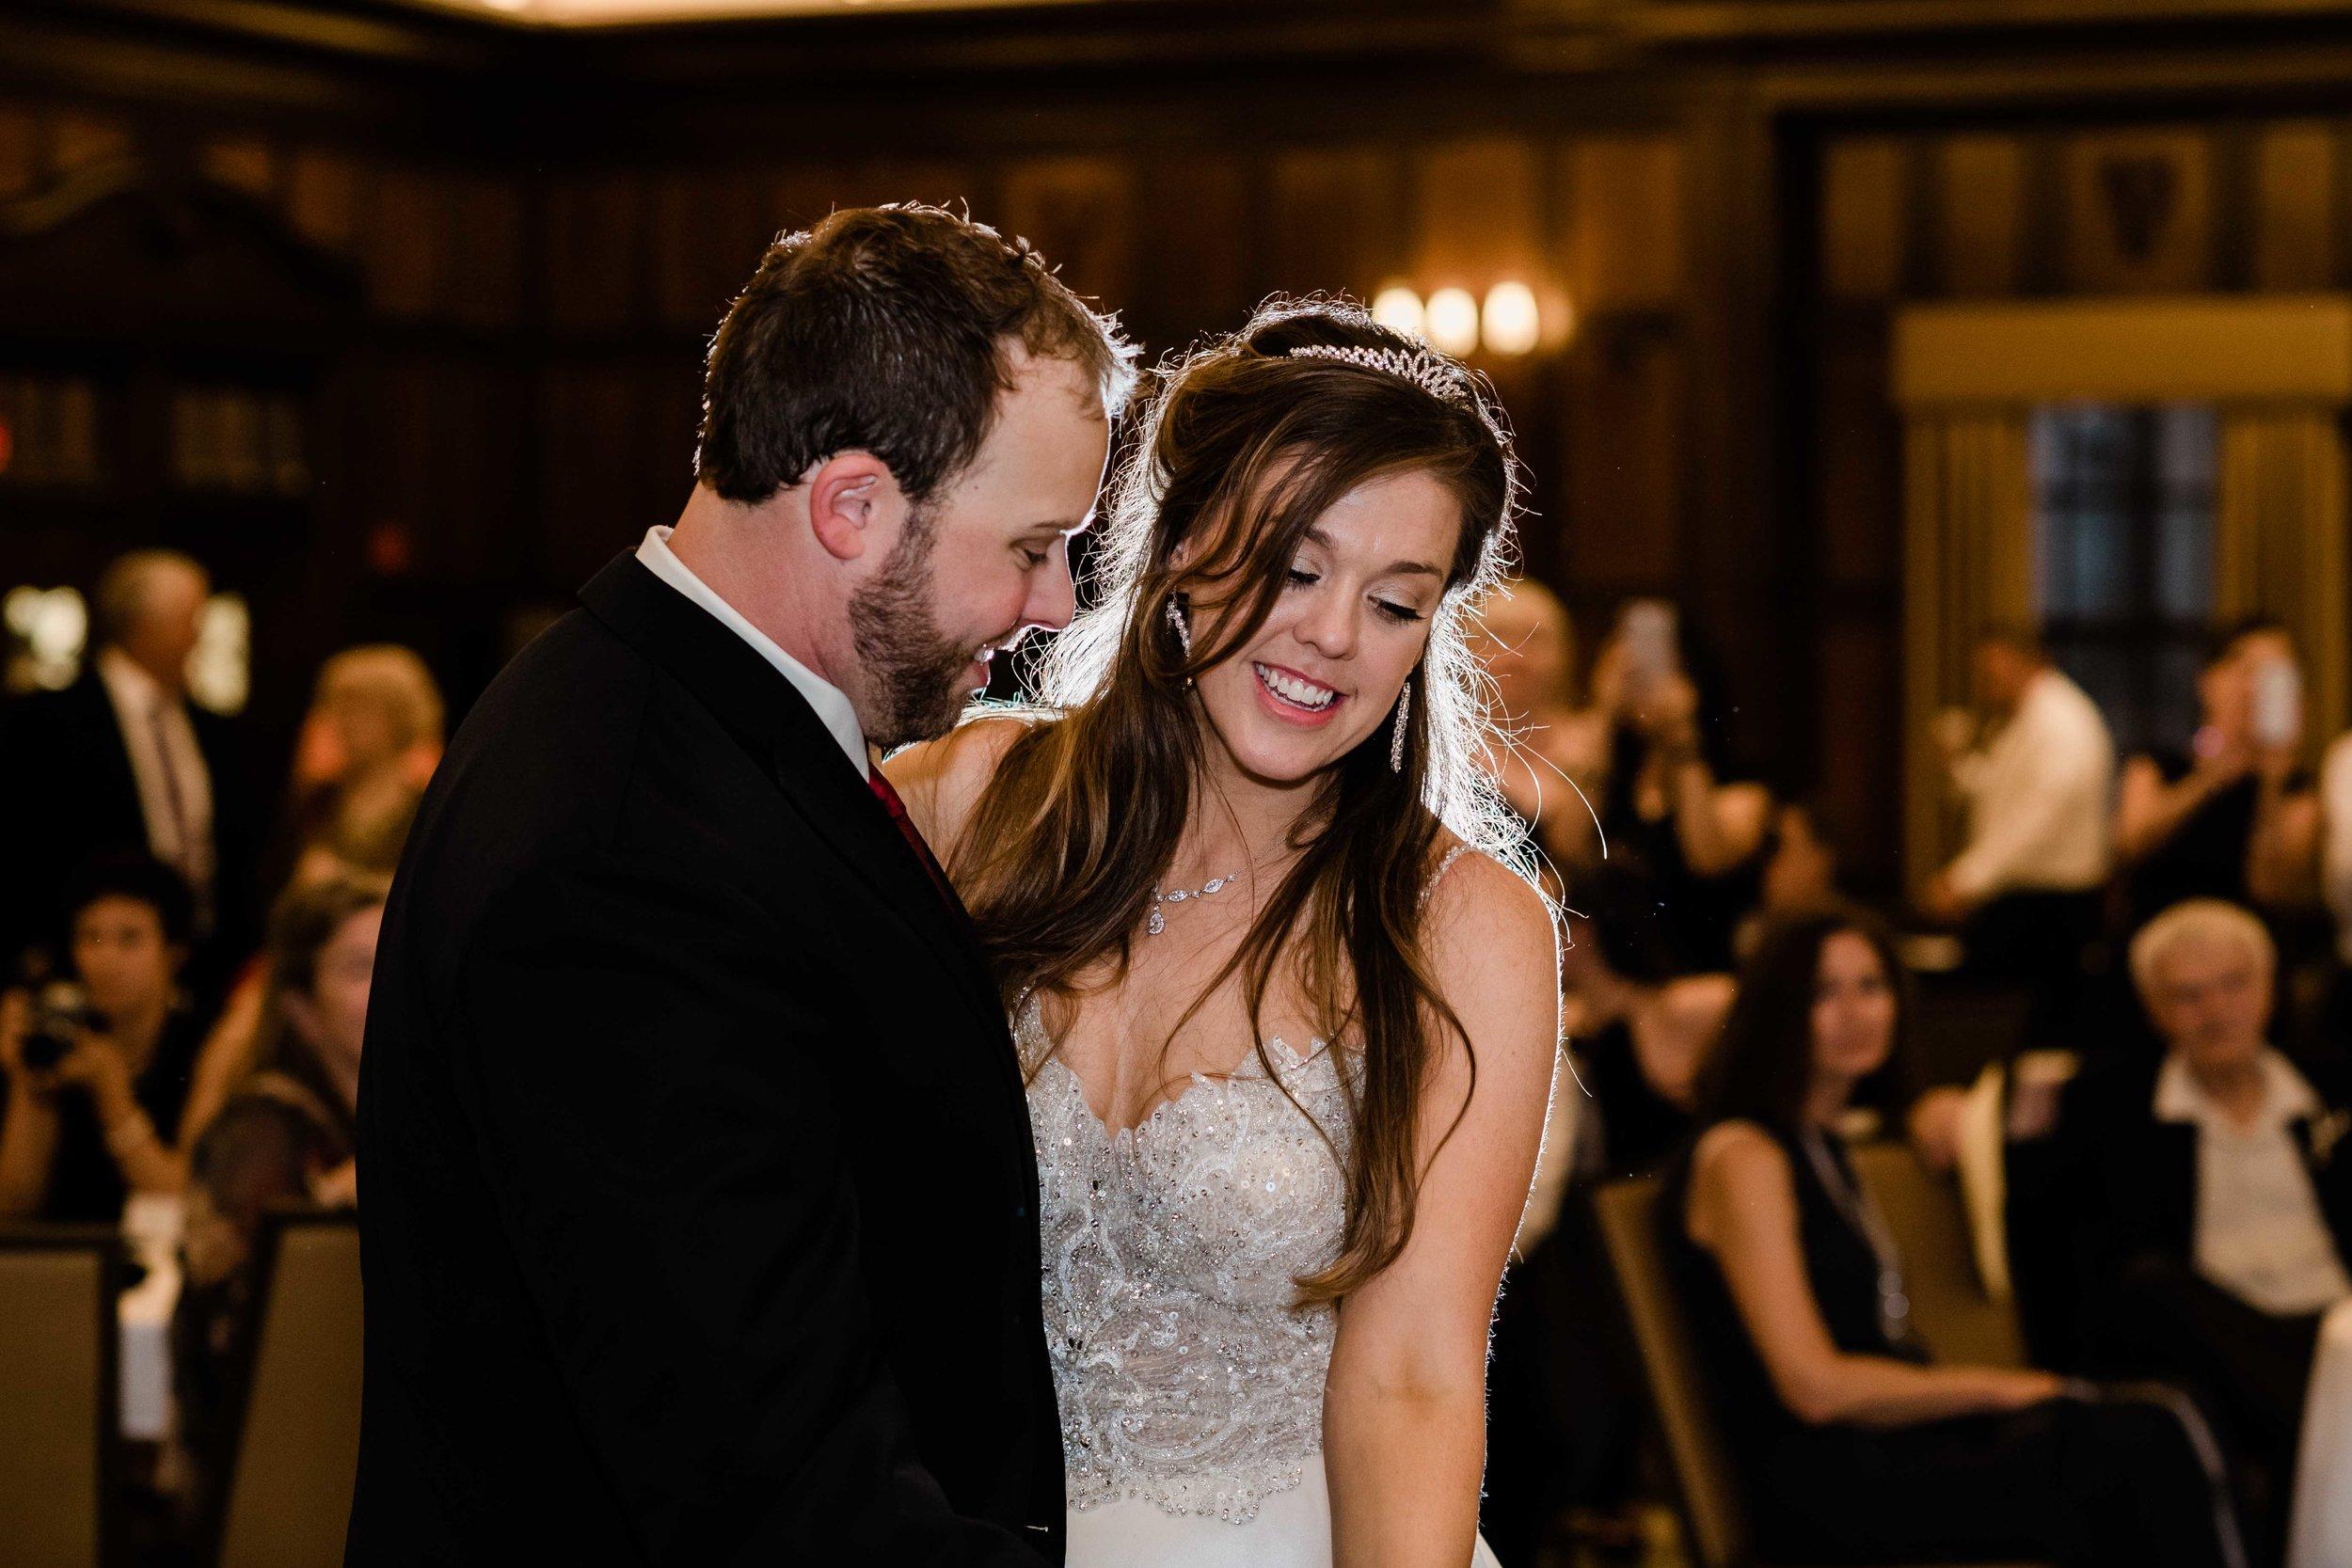 Backlit bride and groom dancing